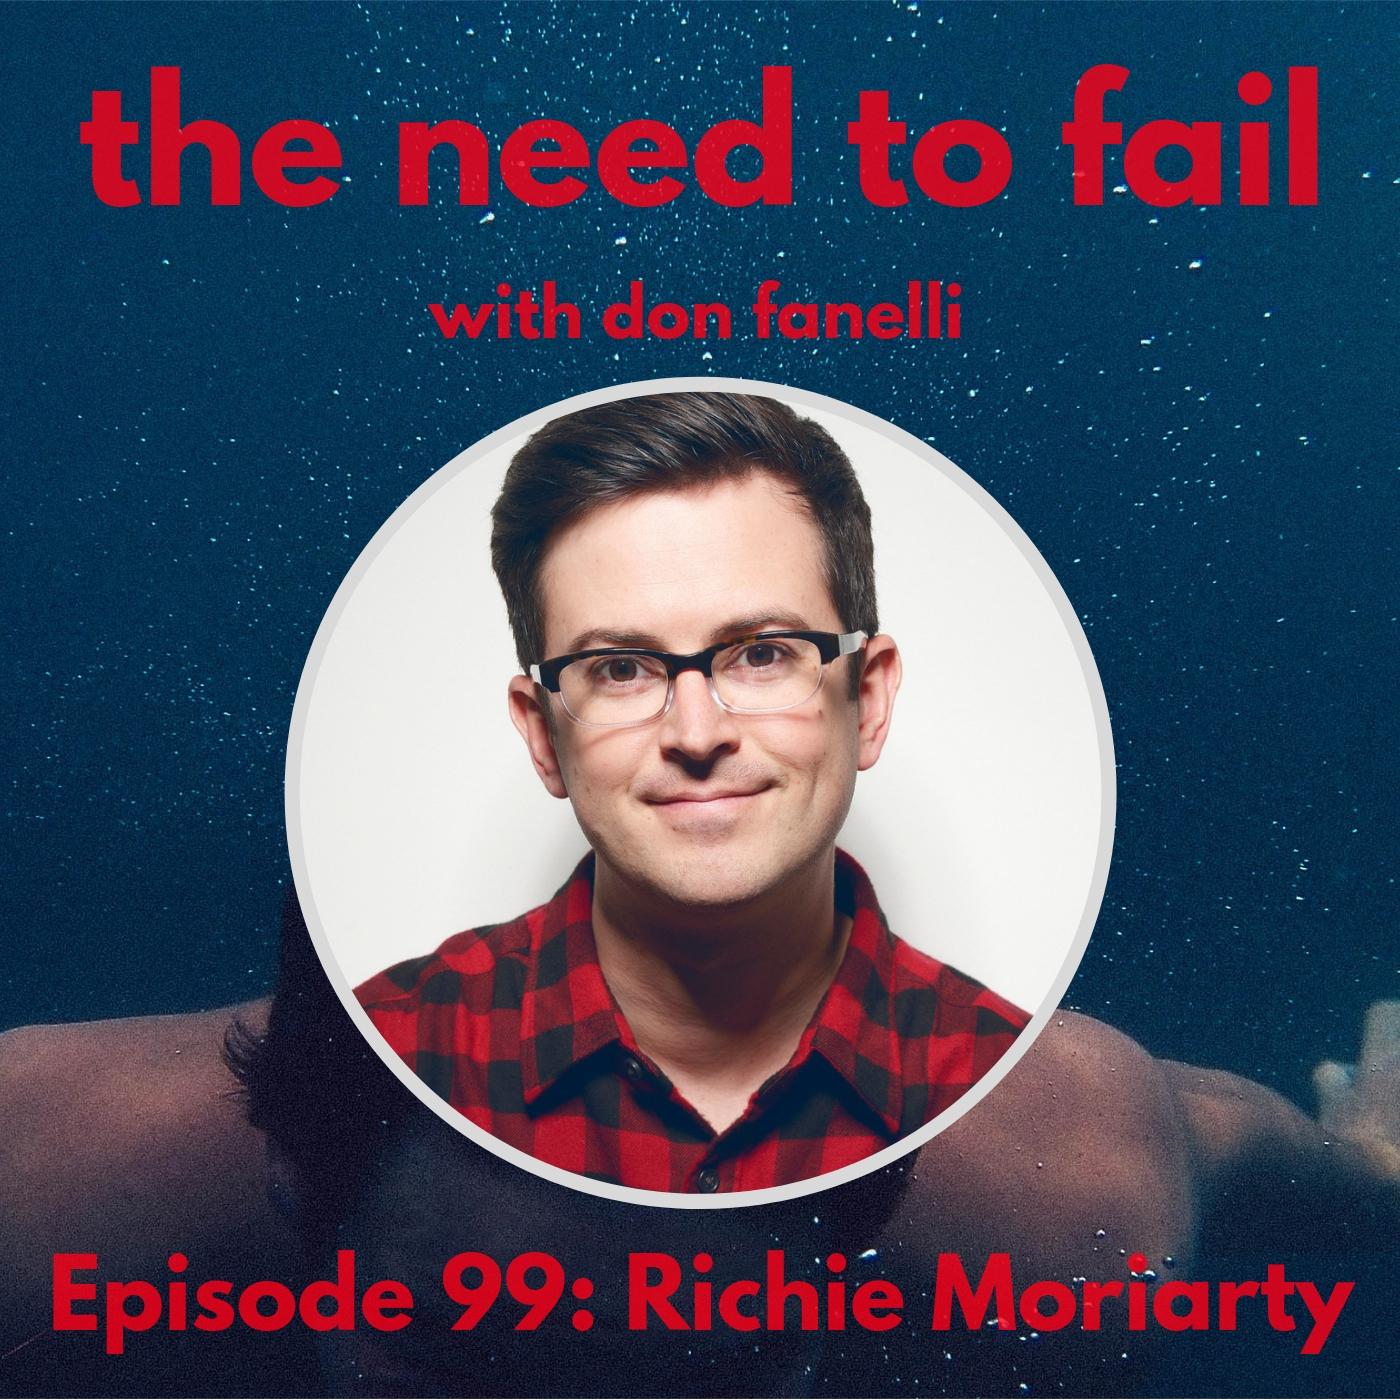 Episode 99: Richie Moriarty